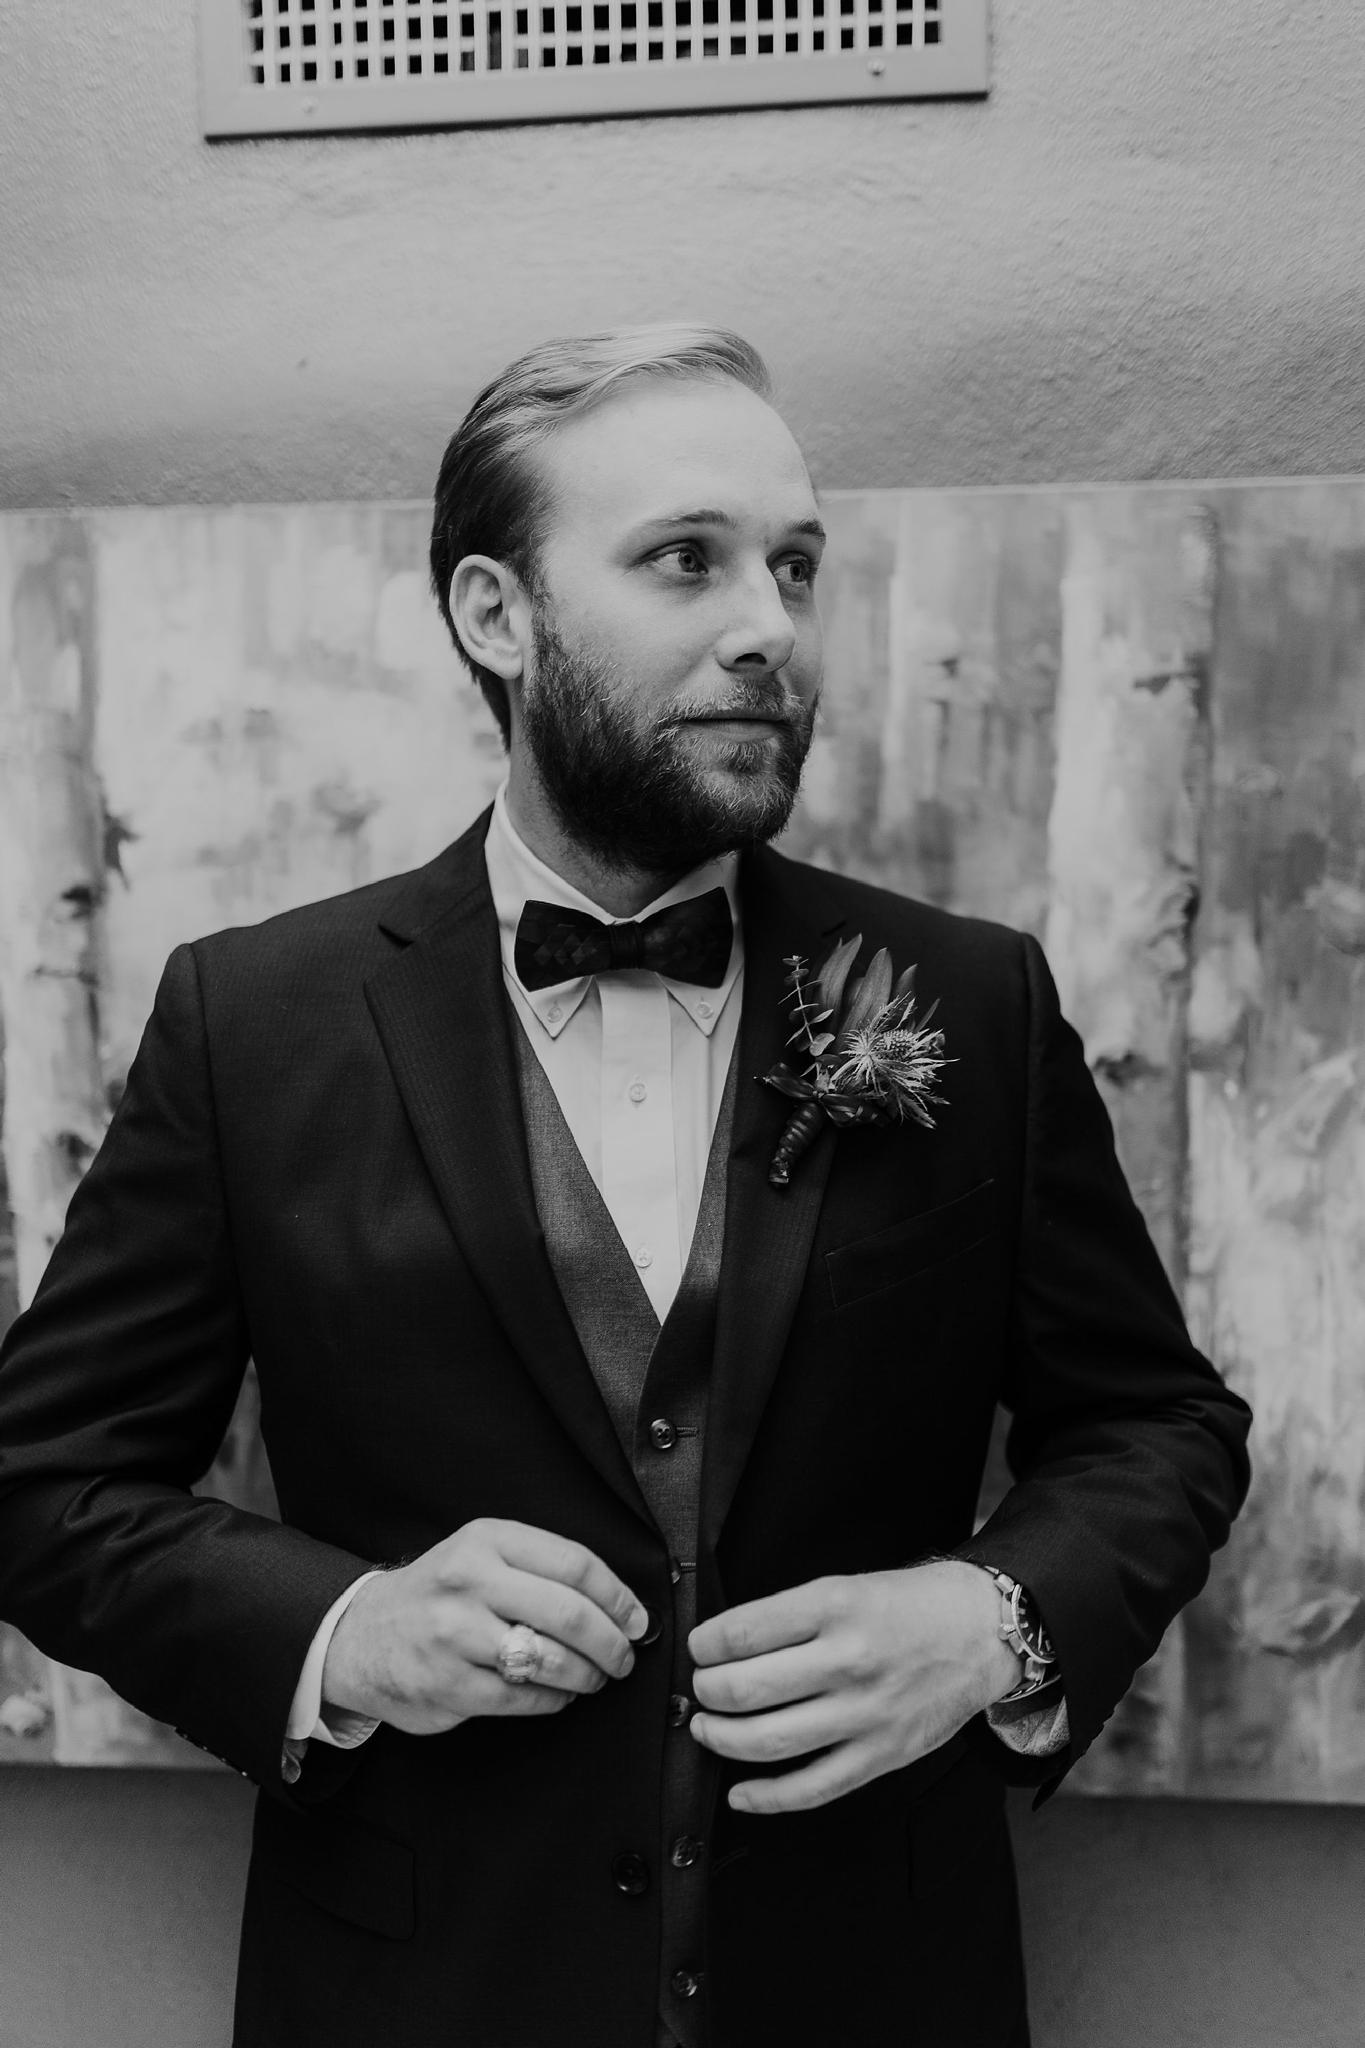 Alicia+lucia+photography+-+albuquerque+wedding+photographer+-+santa+fe+wedding+photography+-+new+mexico+wedding+photographer+-+new+mexico+wedding+-+wedding+-+groom+-+groom+style+-+wedding+style_0035.jpg